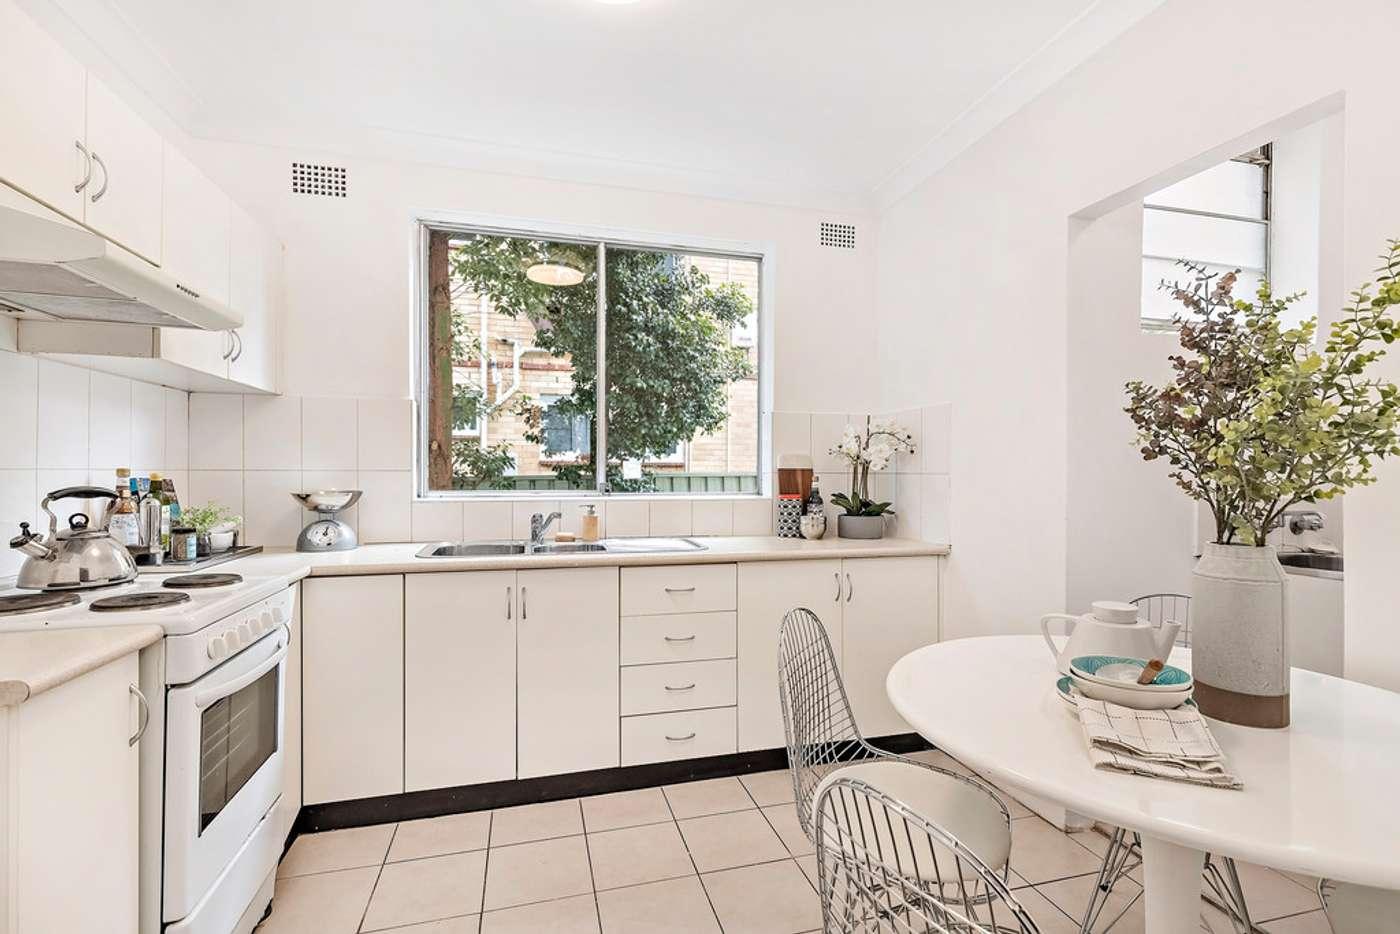 Main view of Homely unit listing, 2/22 Chandos Street, Ashfield NSW 2131